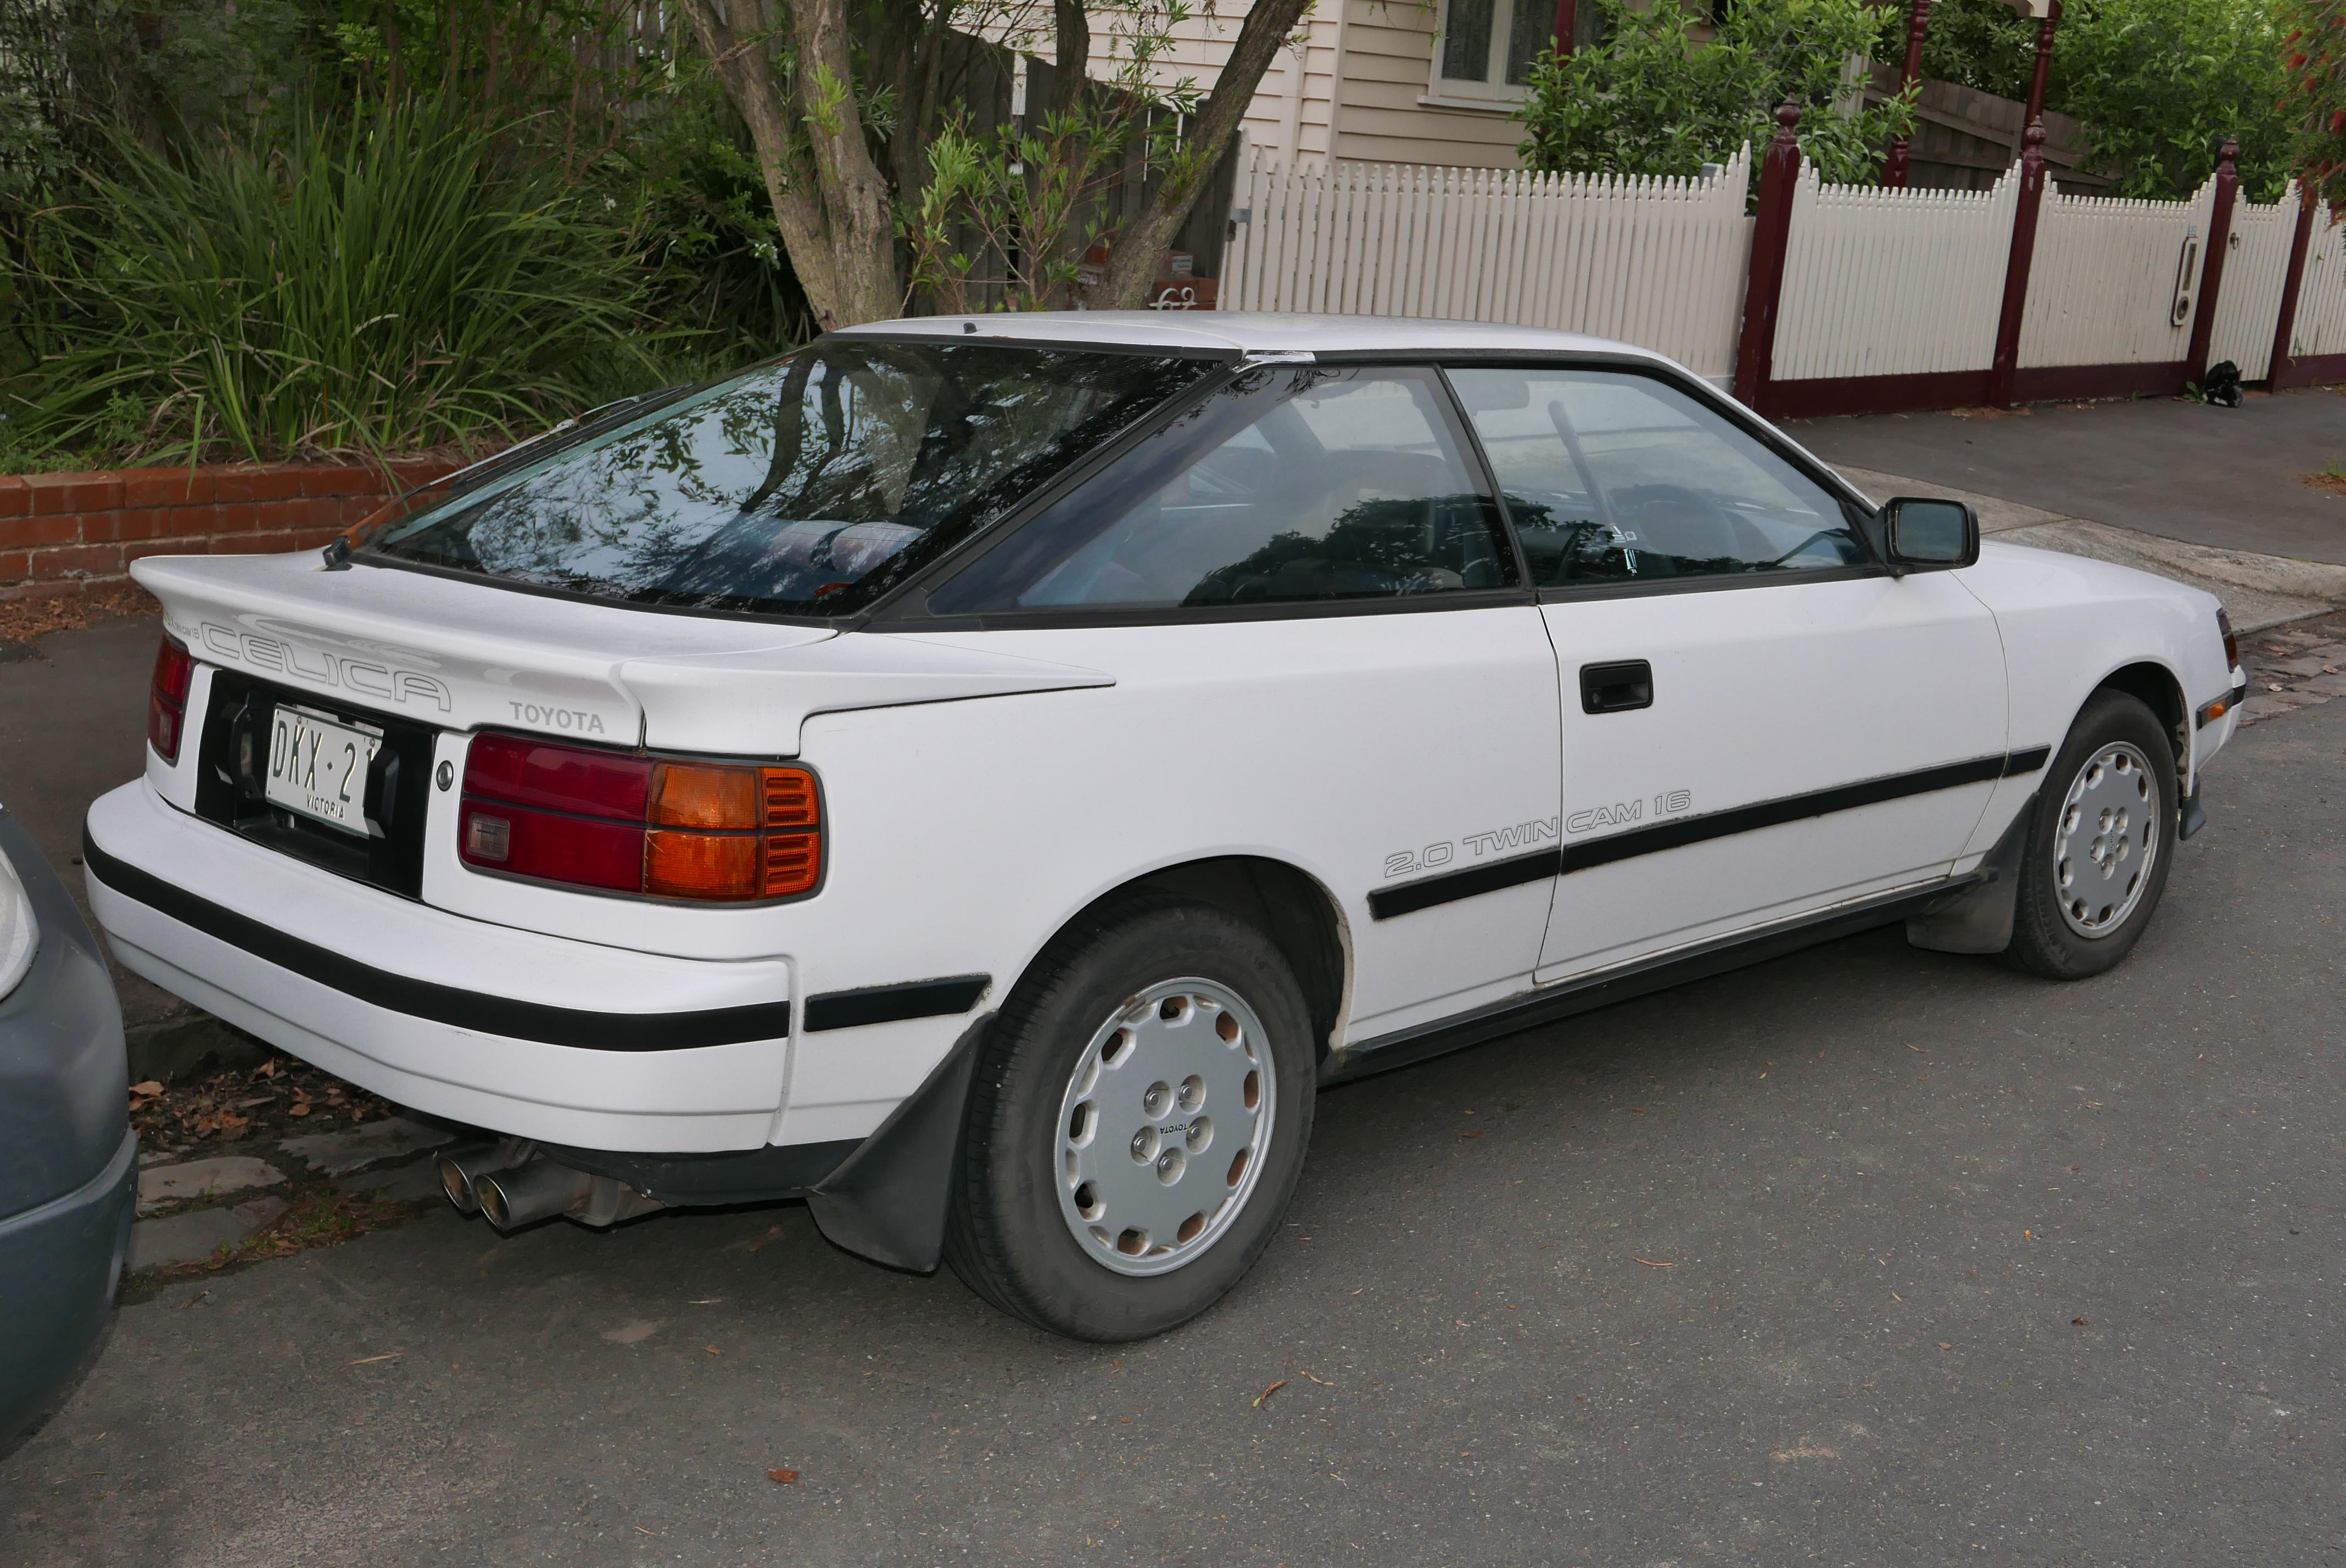 Toyota Celica 2015 >> File:1988 Toyota Celica (ST162) SX liftback (2015-11-11) 02.jpg - Wikimedia Commons